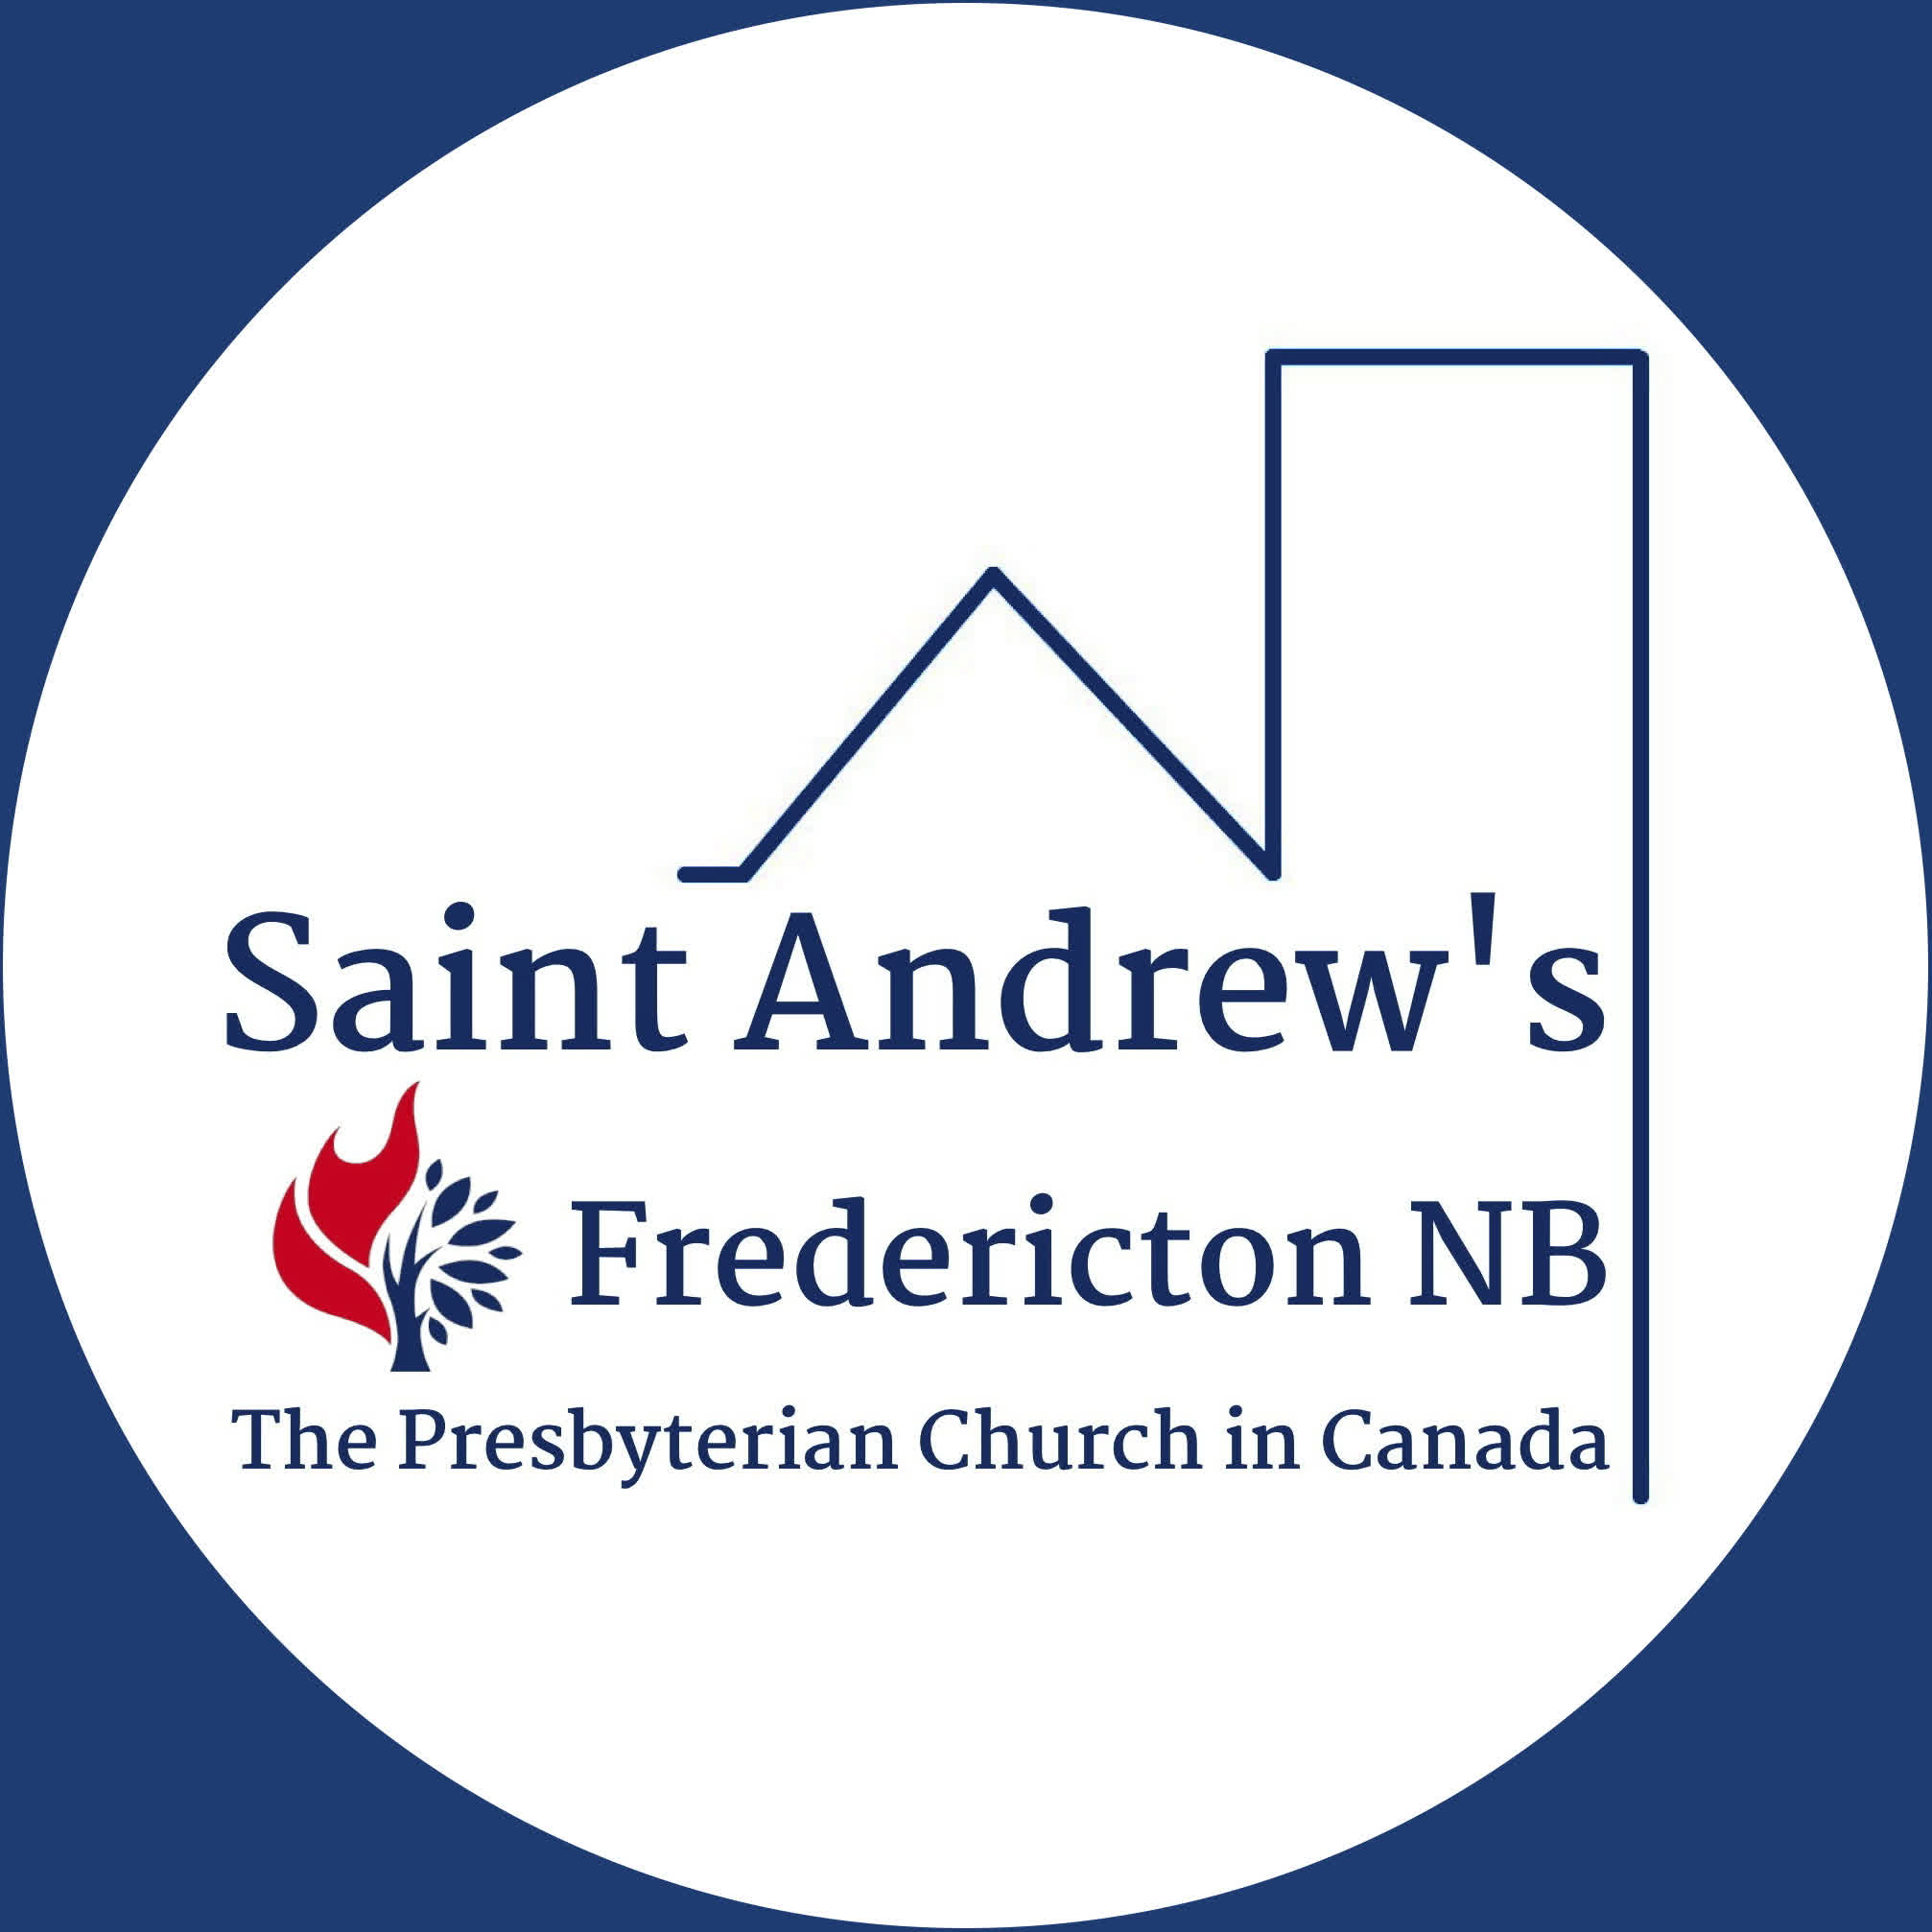 Saint Andrew's Presbyterian Church, Fredericton NB